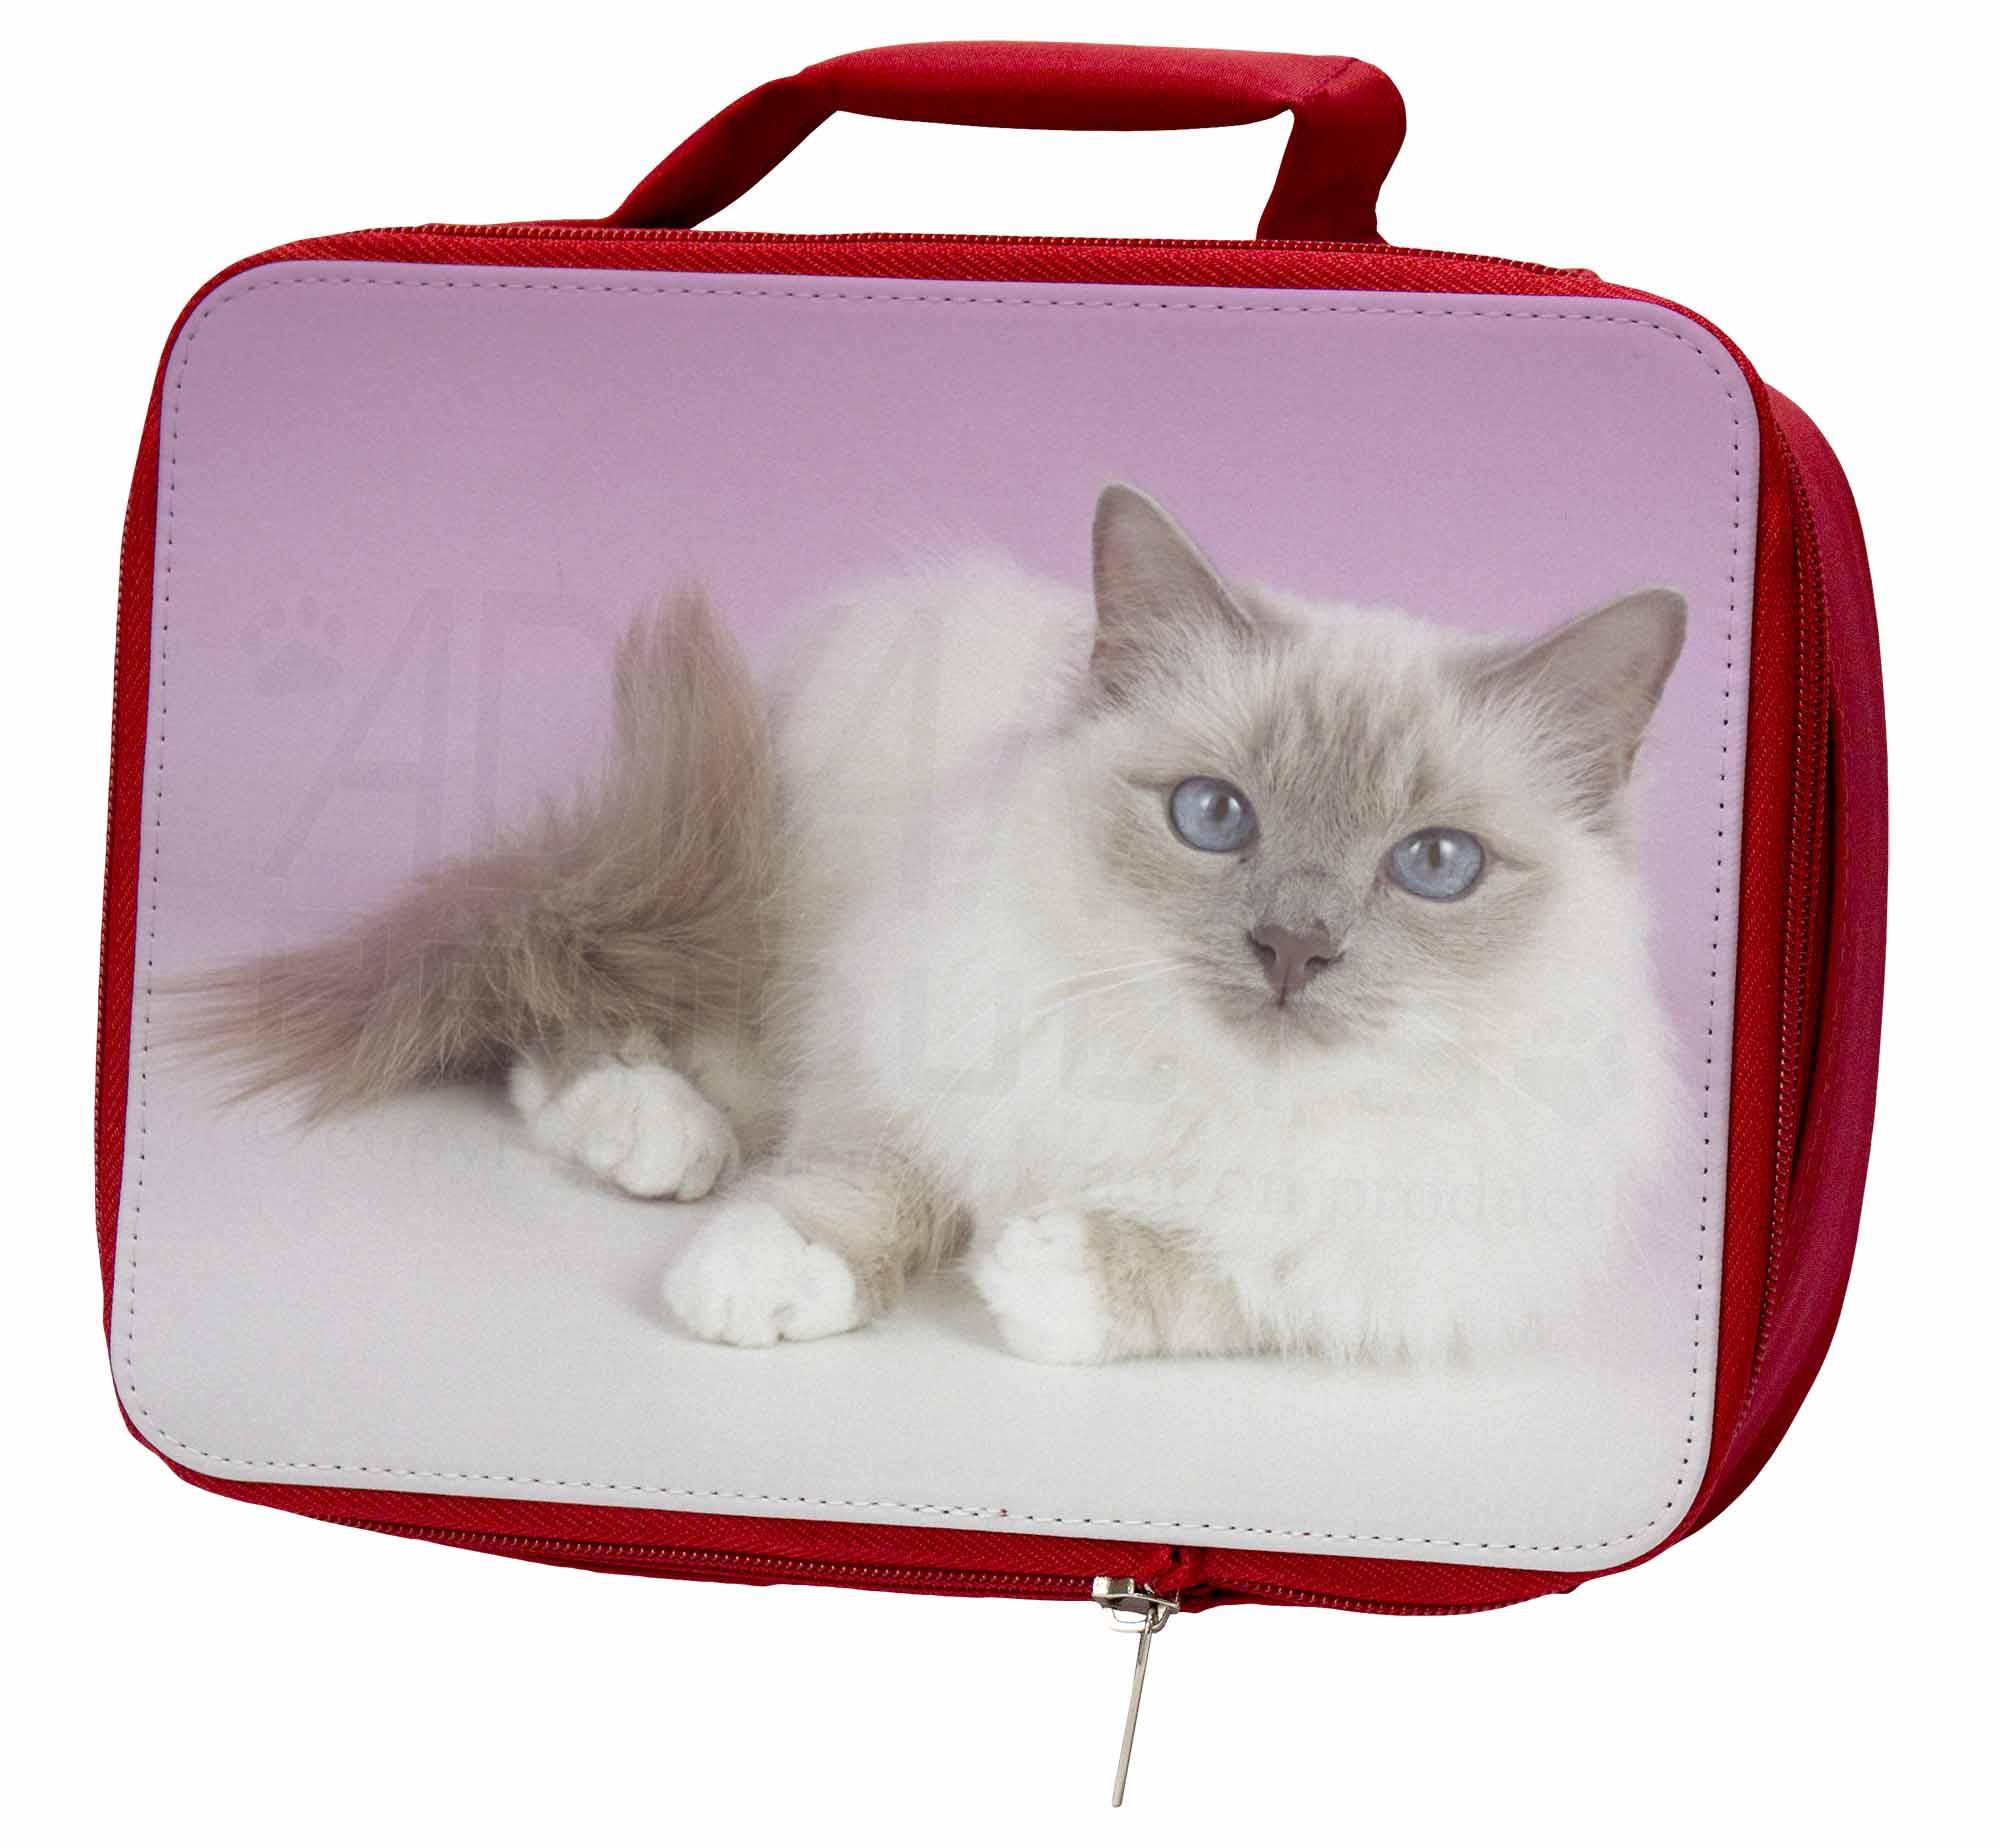 Lilac Birman AC-91LBR Cat Insulated Red School Lunch Box/Picnic Bag, AC-91LBR Birman 0ef201